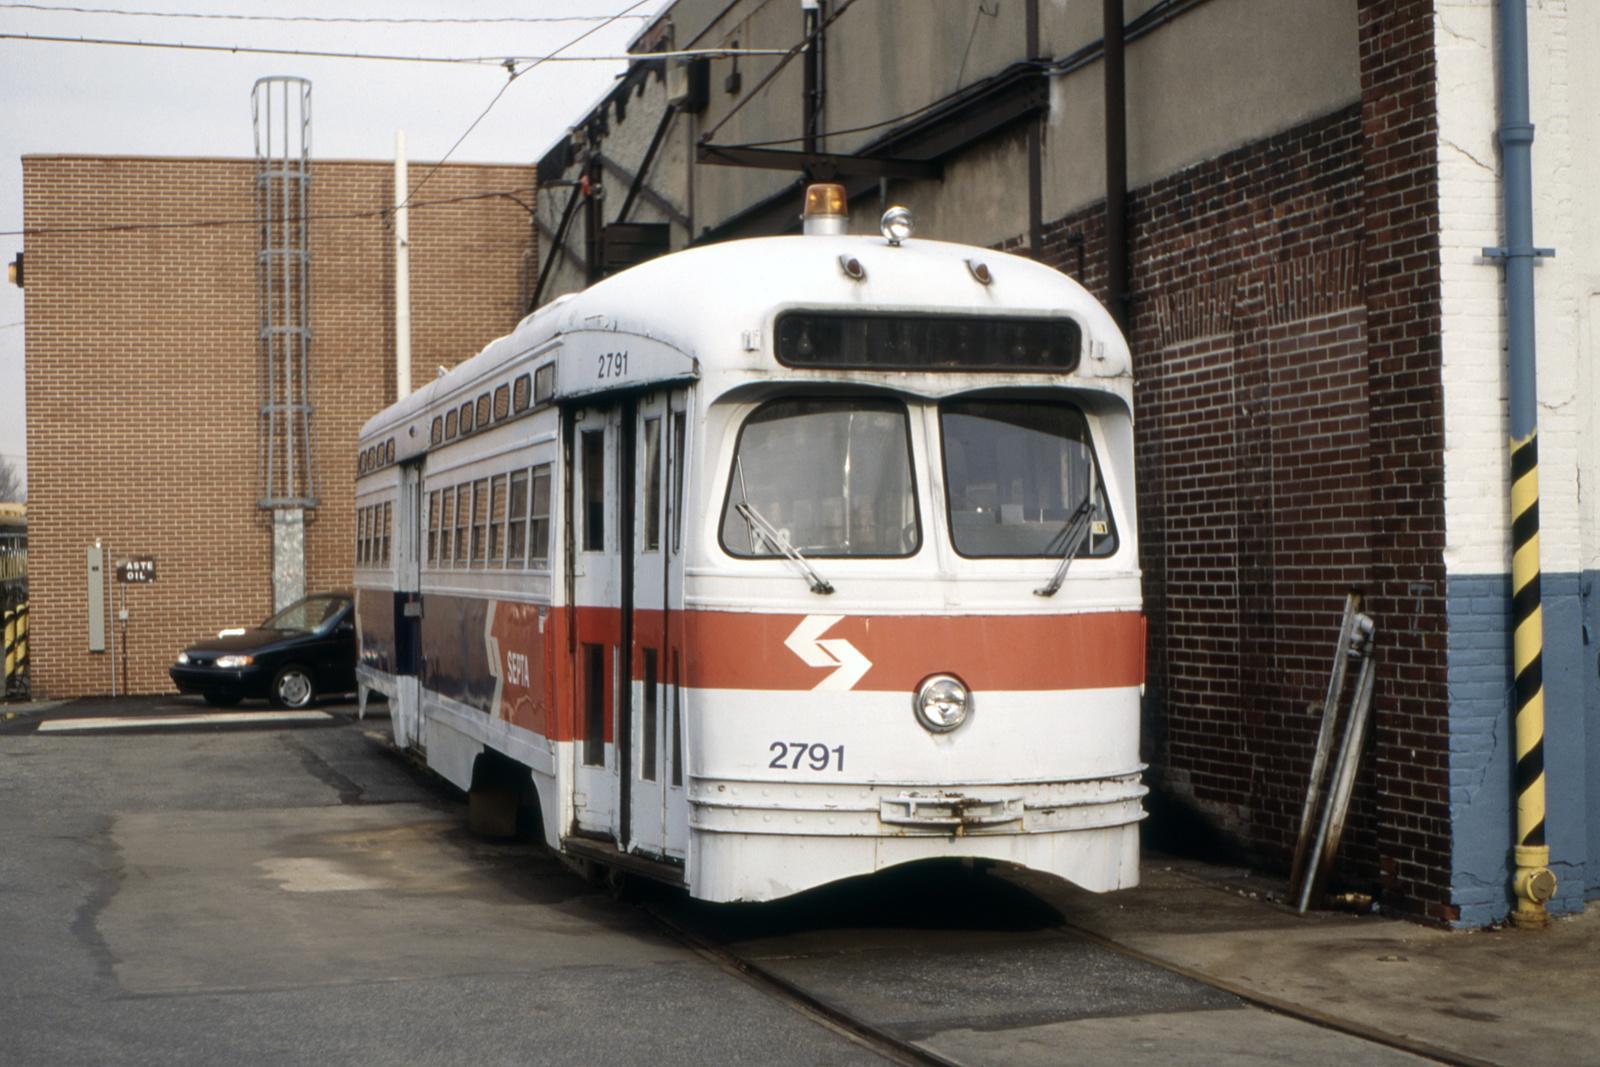 (702k, 1600x1067)<br><b>Country:</b> United States<br><b>City:</b> Philadelphia, PA<br><b>System:</b> SEPTA (or Predecessor)<br><b>Line:</b> Rt. 23-Germantown<br><b>Location:</b> Germantown Depot<br><b>Car:</b> PTC/SEPTA Postwar All-electric PCC (St.Louis, 1947) 2791 <br><b>Collection of:</b> David Pirmann<br><b>Date:</b> 12/1994<br><b>Viewed (this week/total):</b> 1 / 93